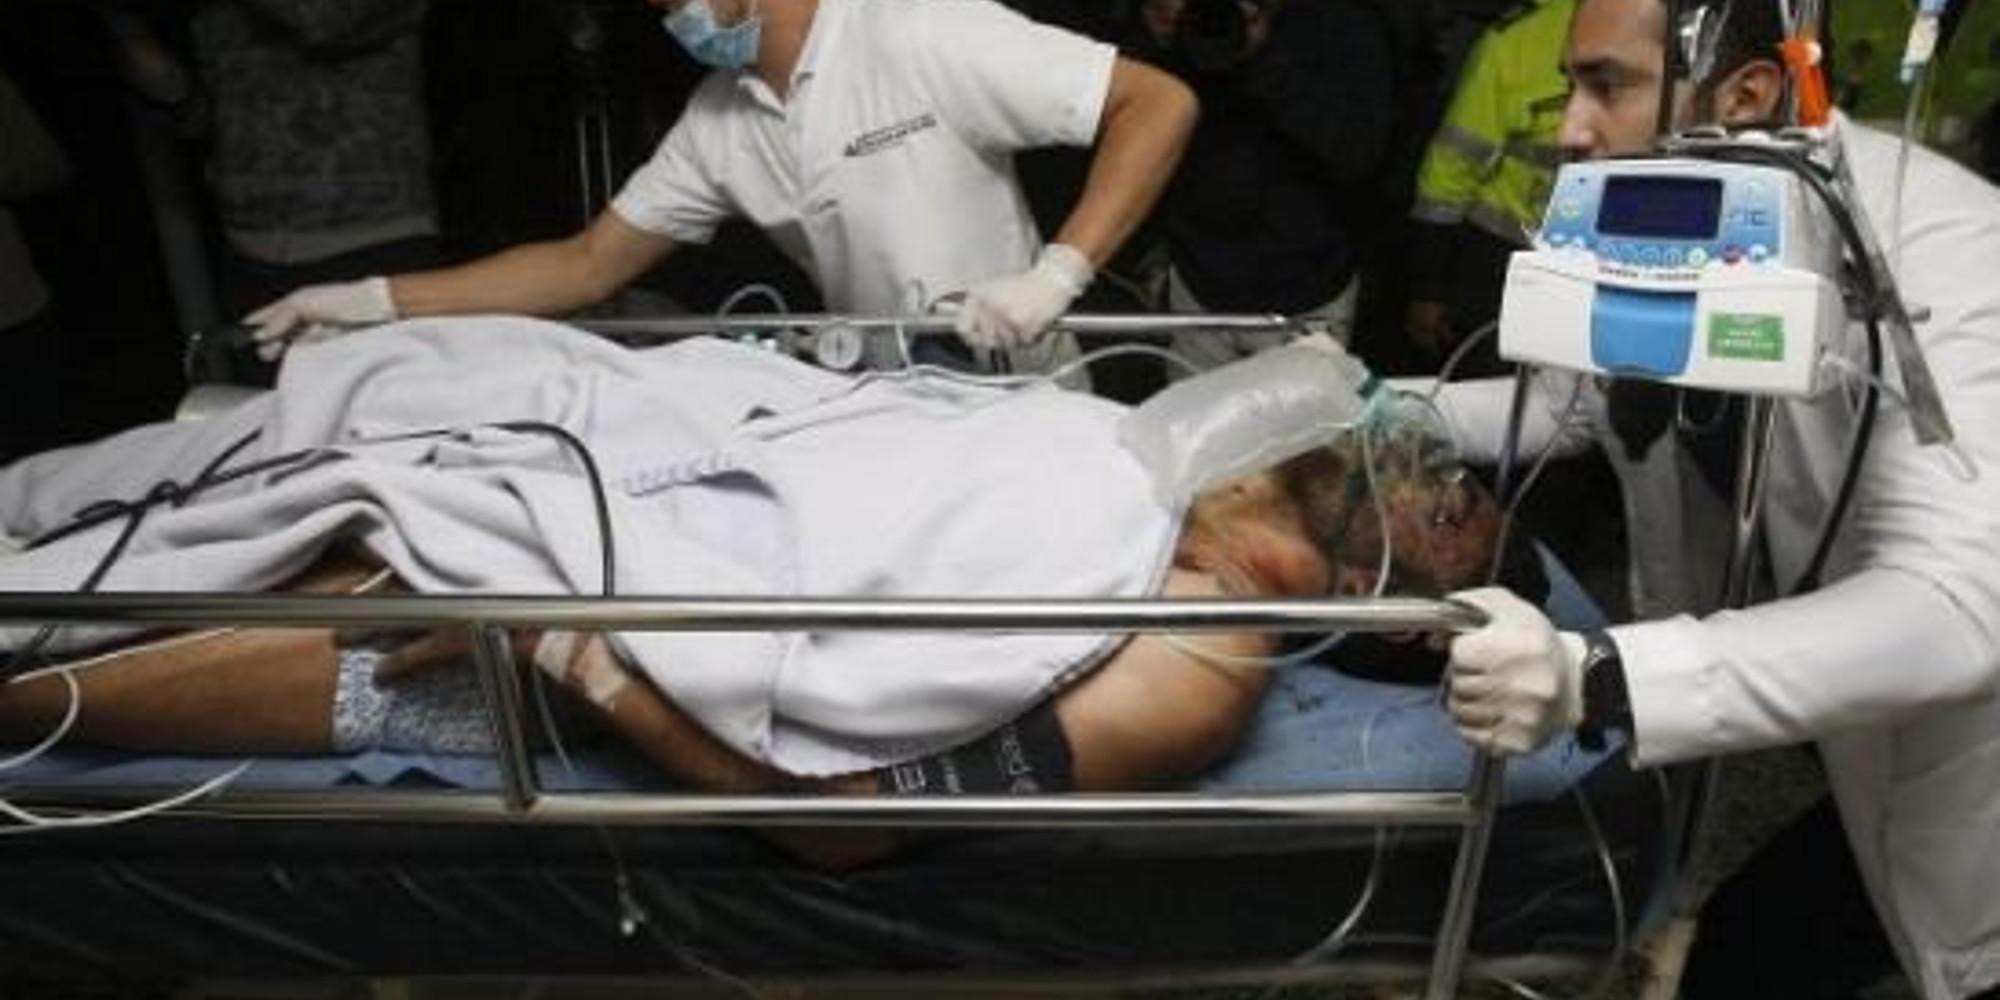 epizontas-aeroporiko-colomvia-1000 Τραγικός απολογισμός: 75 νεκροί, 6 επιζώντες από την συντριβή αεροσκάφους στην Κολομβία